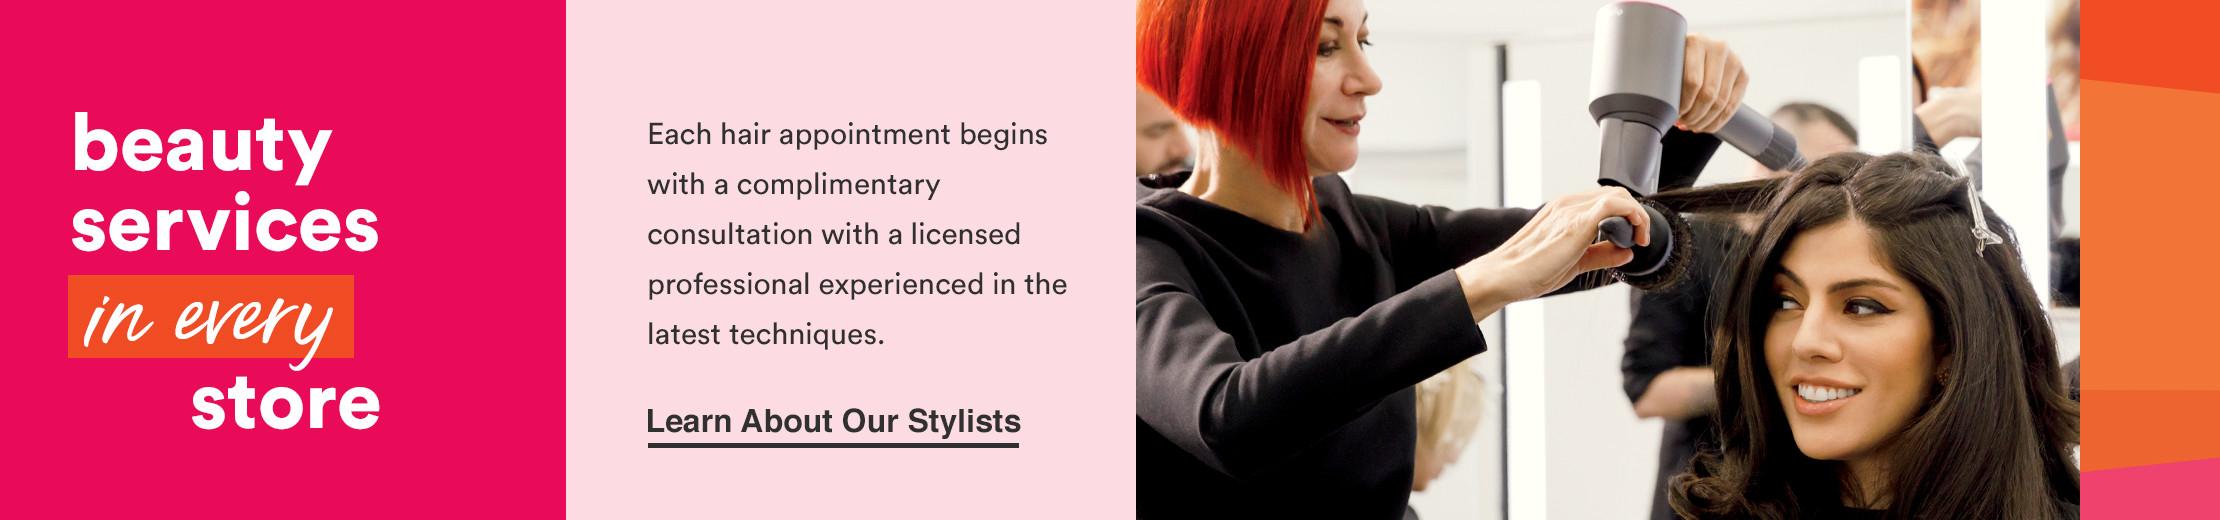 ulta salon hair & beauty services menu | the salon at ulta